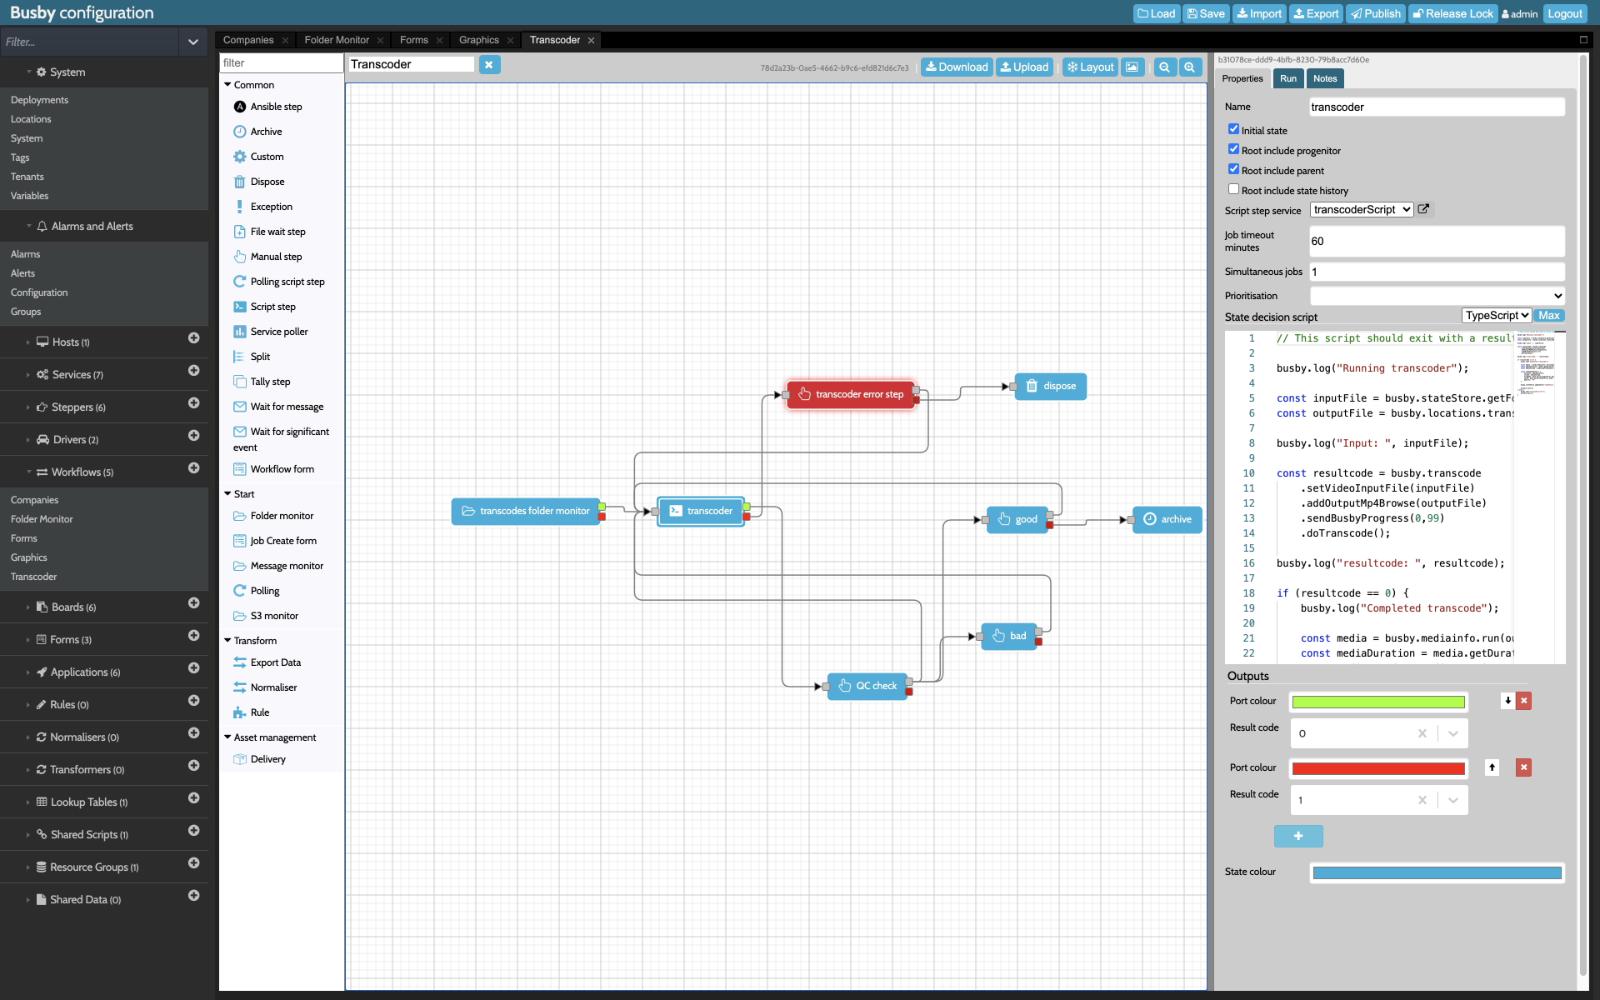 Busby_config_workflow_script_screenshot